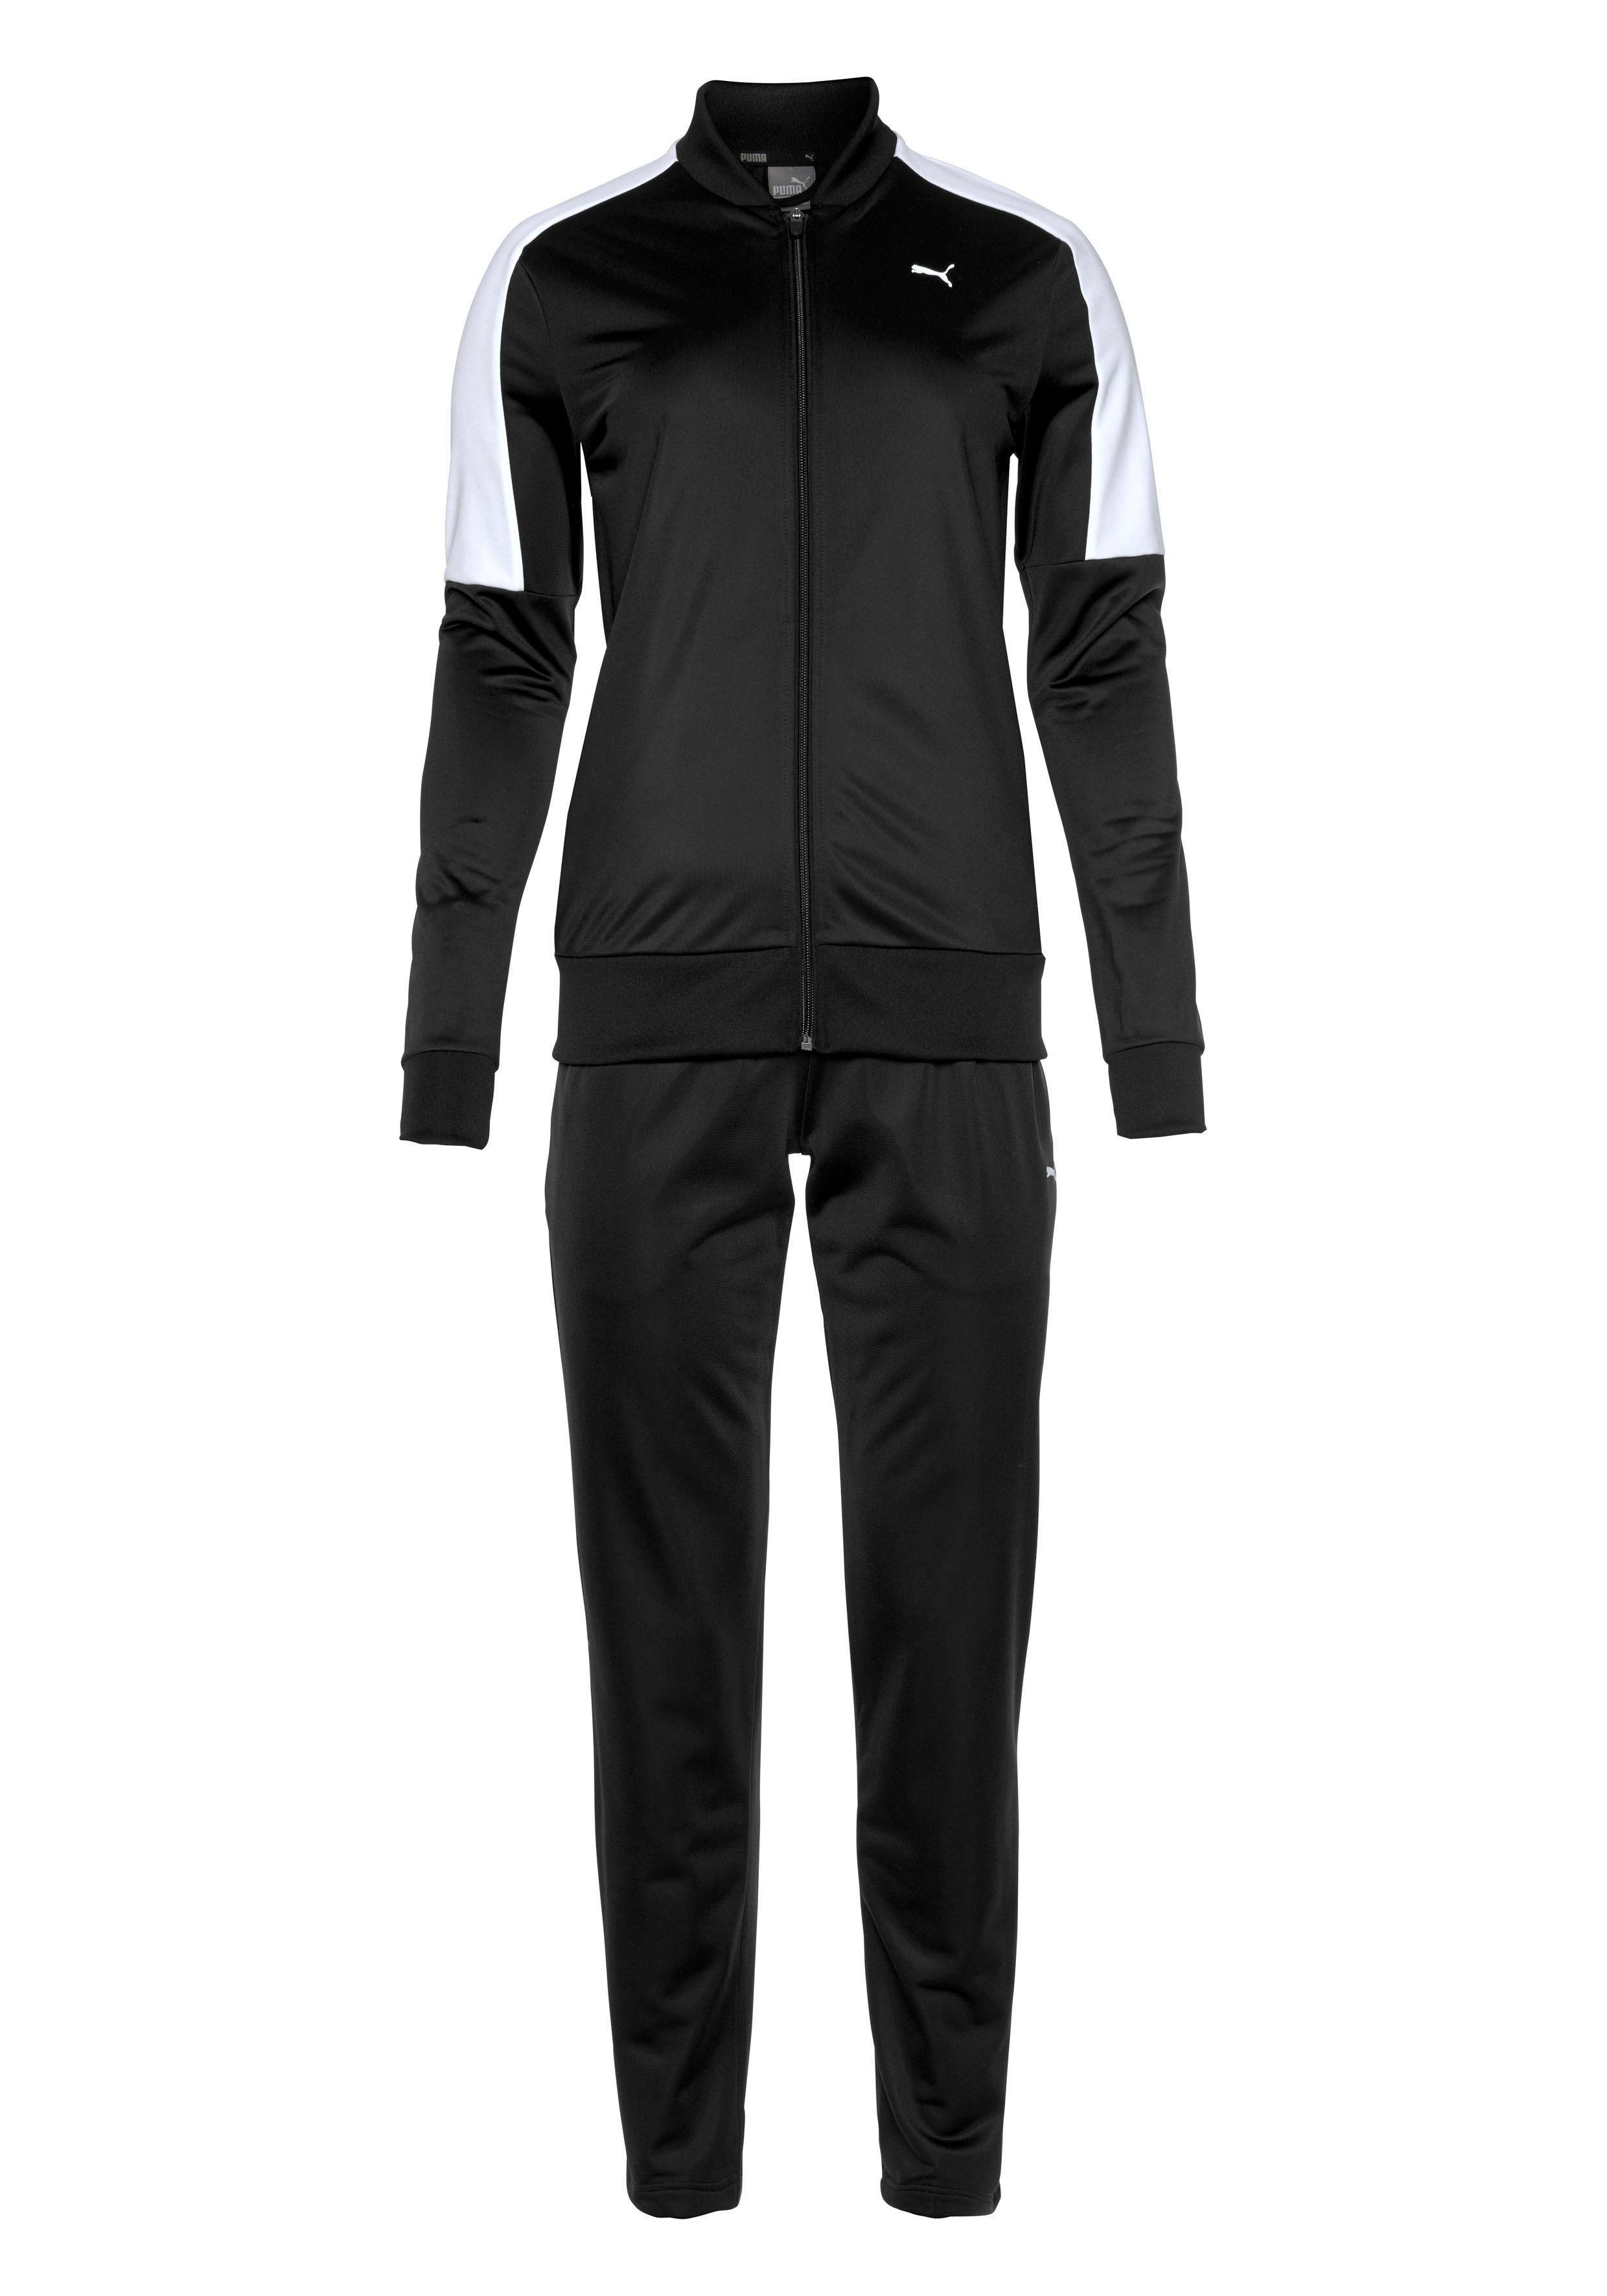 Trainingspakclean Bij Puma OpBestel Nu Tricot Suit pqzMSVU